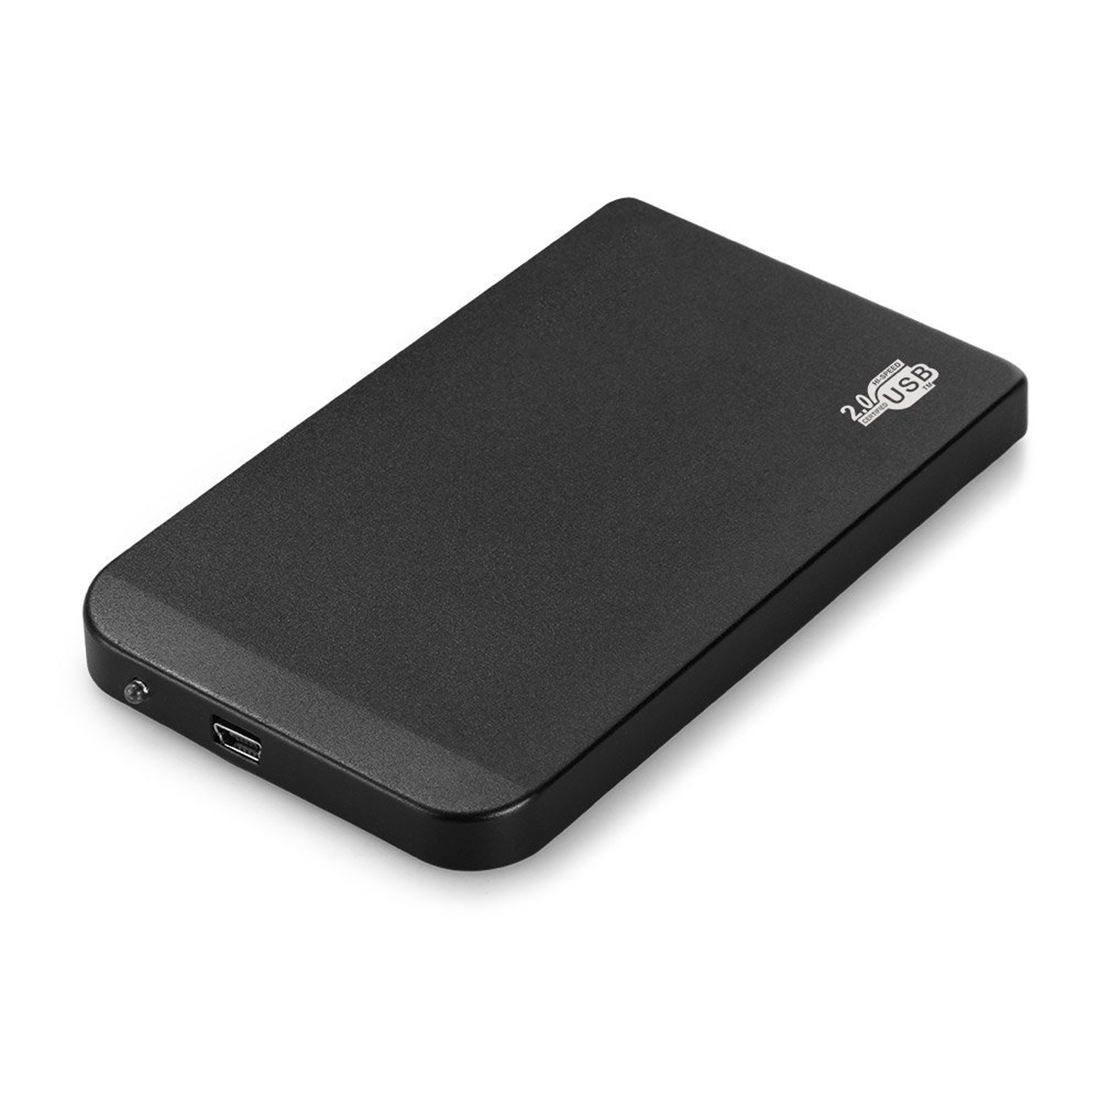 NOYOKERE Black External Hard Drive Disk Enclosure 2.5 Inch Usb 2.0 Ide Ultra Thin Hdd Portable Case 2 5 ide usb 2 0 external hard drive enclosure case black